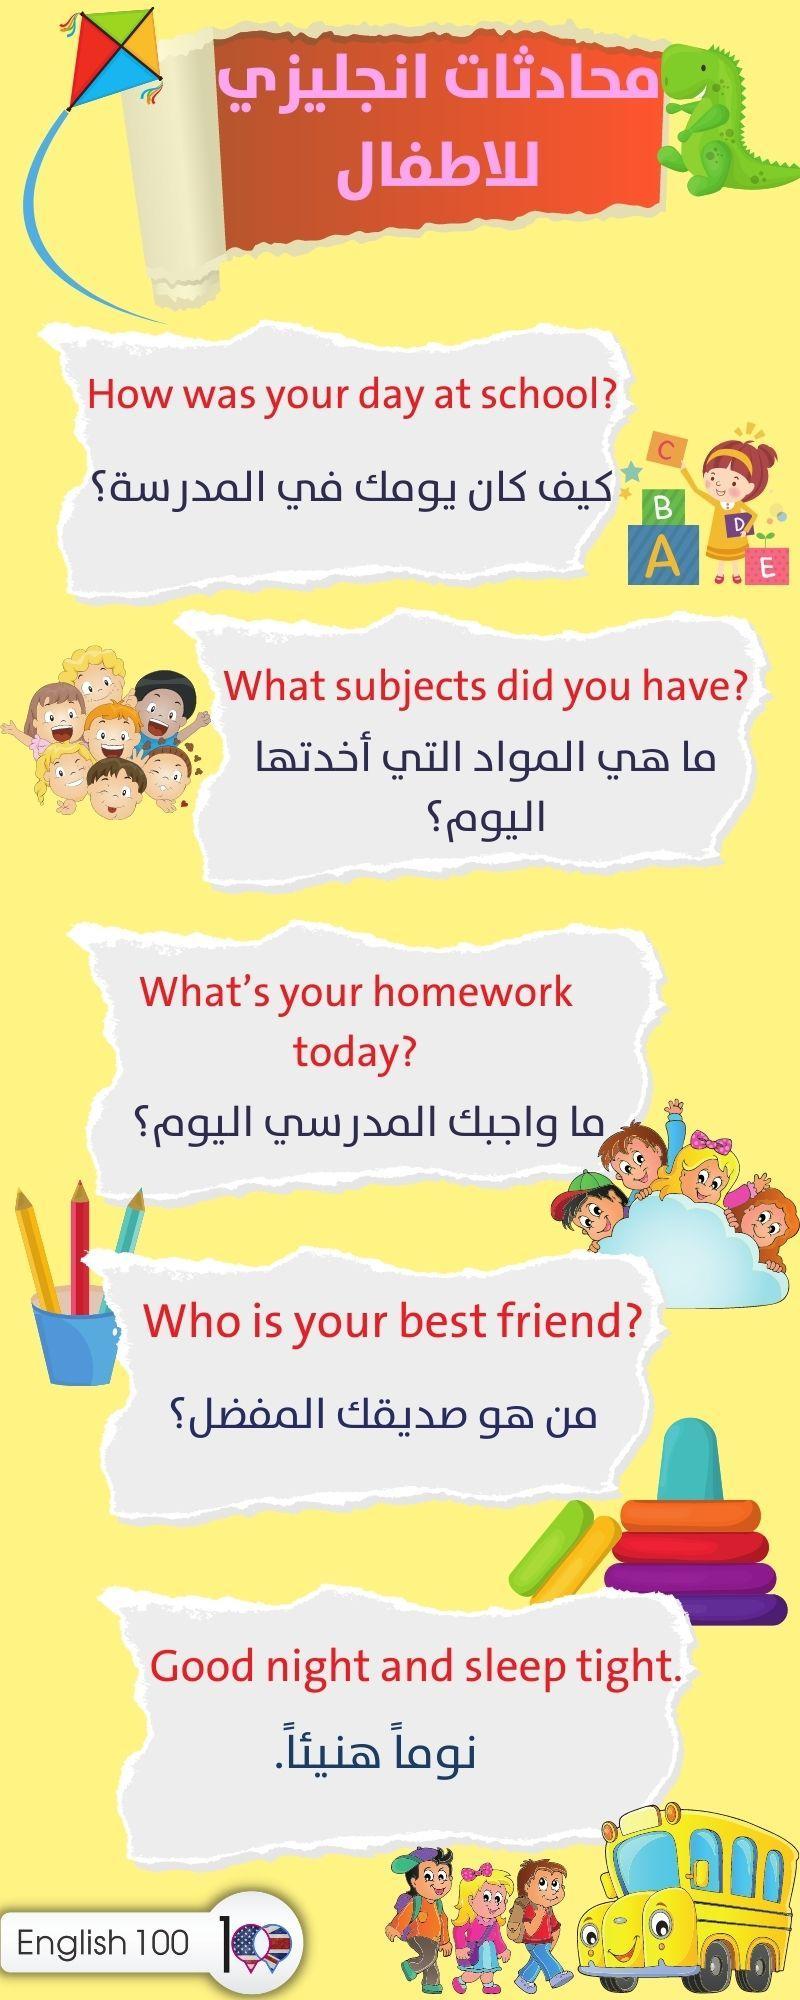 محادثات انجليزي للاطفال English conversations for children